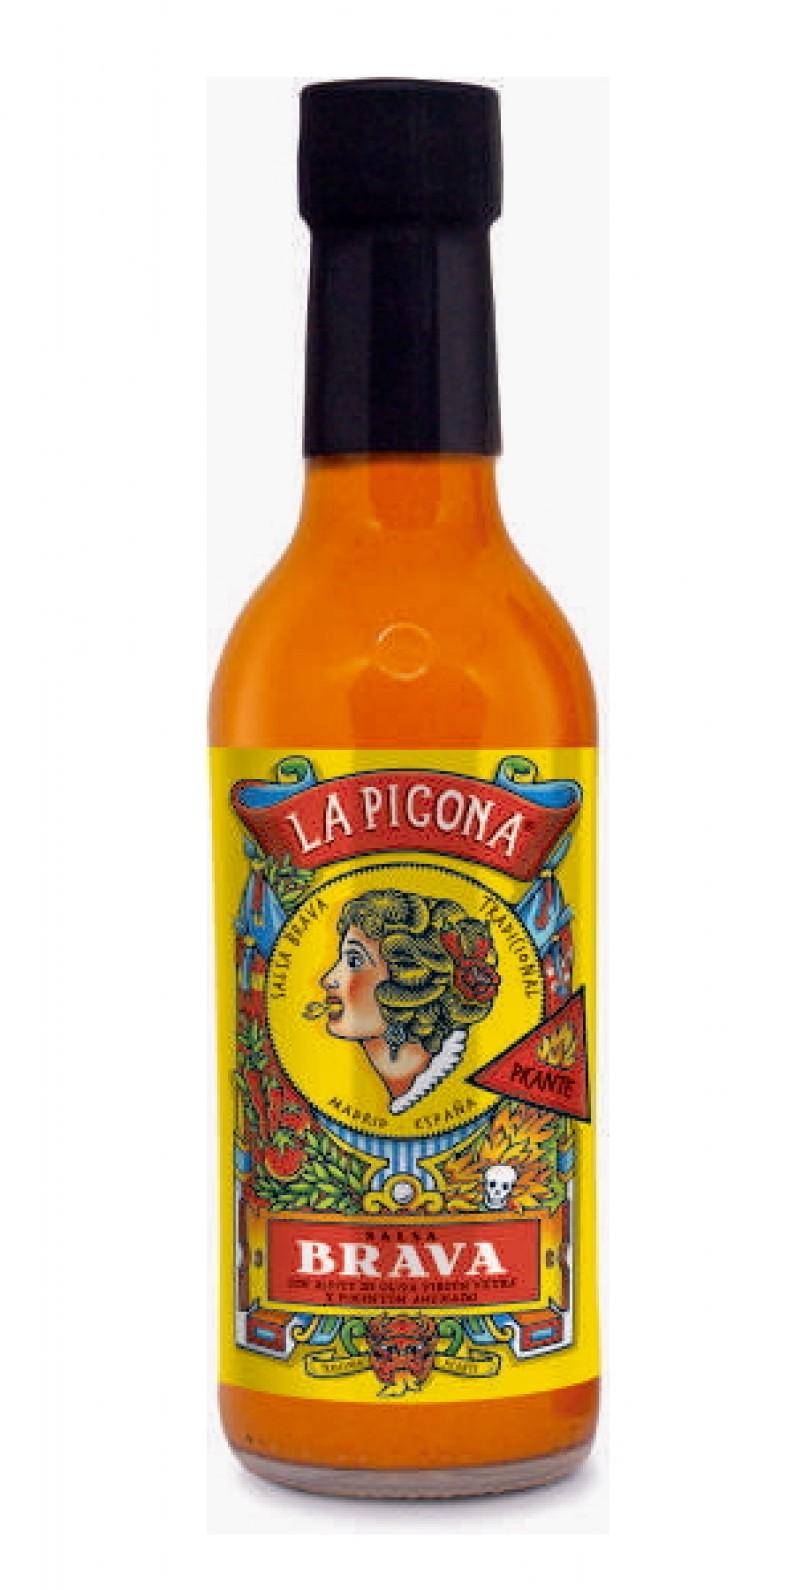 La Picona Brava sauce (spicy) 11 oz